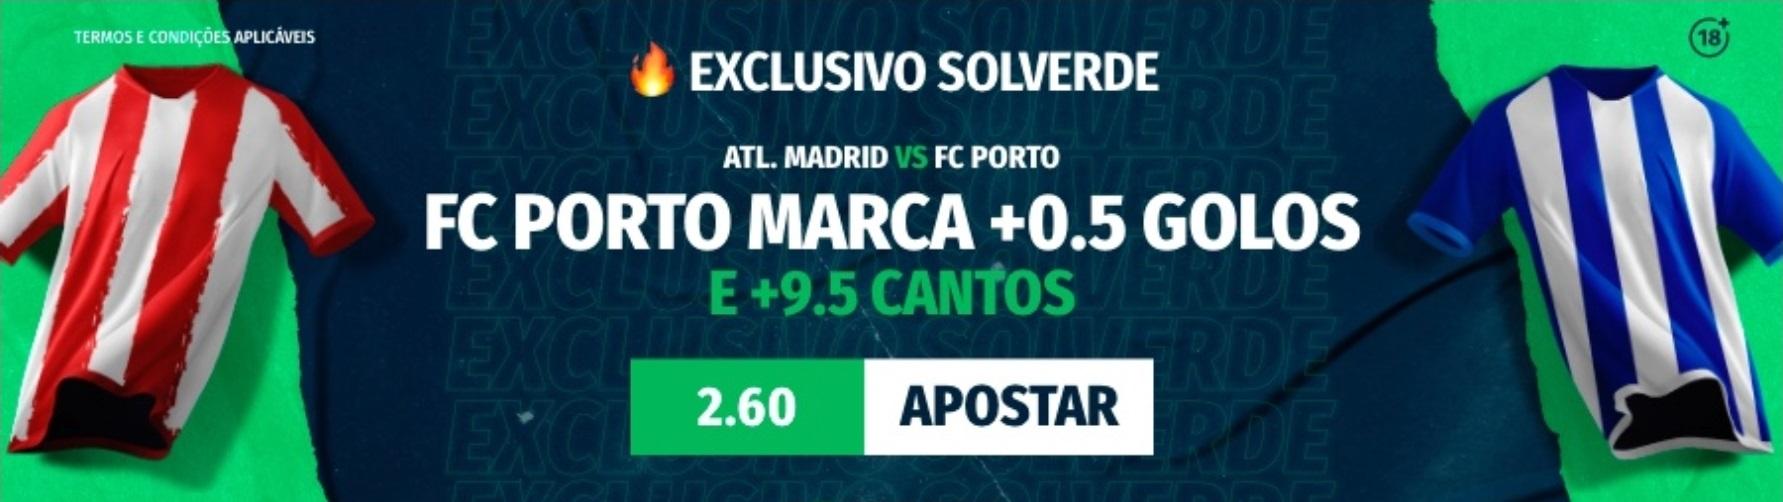 FC Porto Sporting UCL